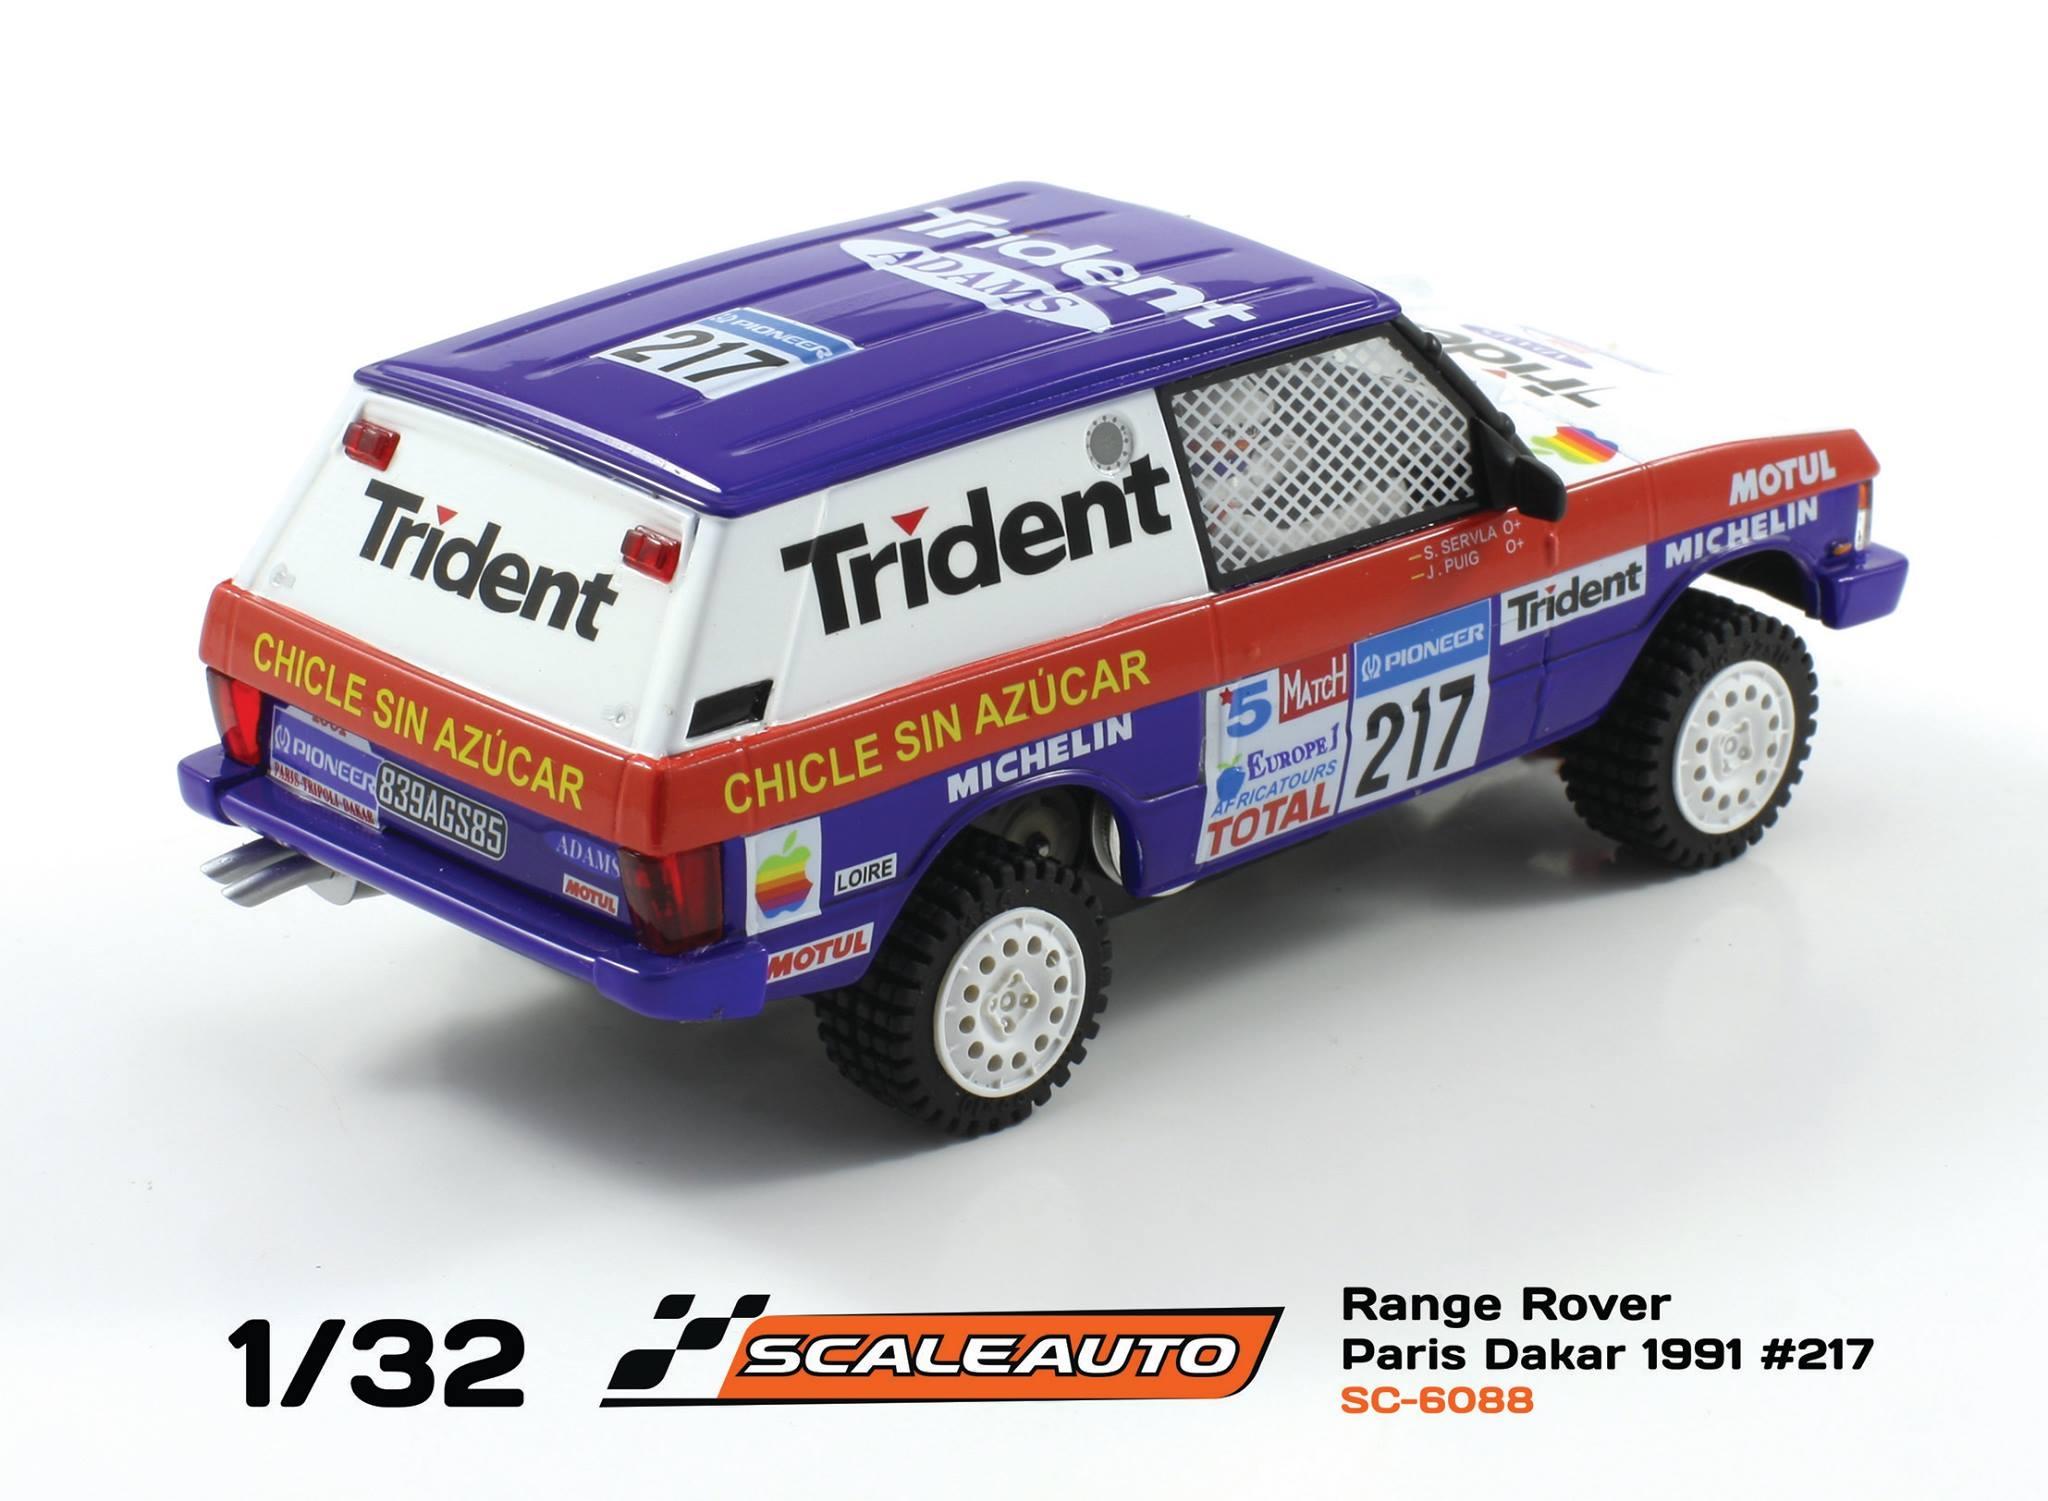 Scaleauto: le Range Rover Trident Paris Dakar 1991